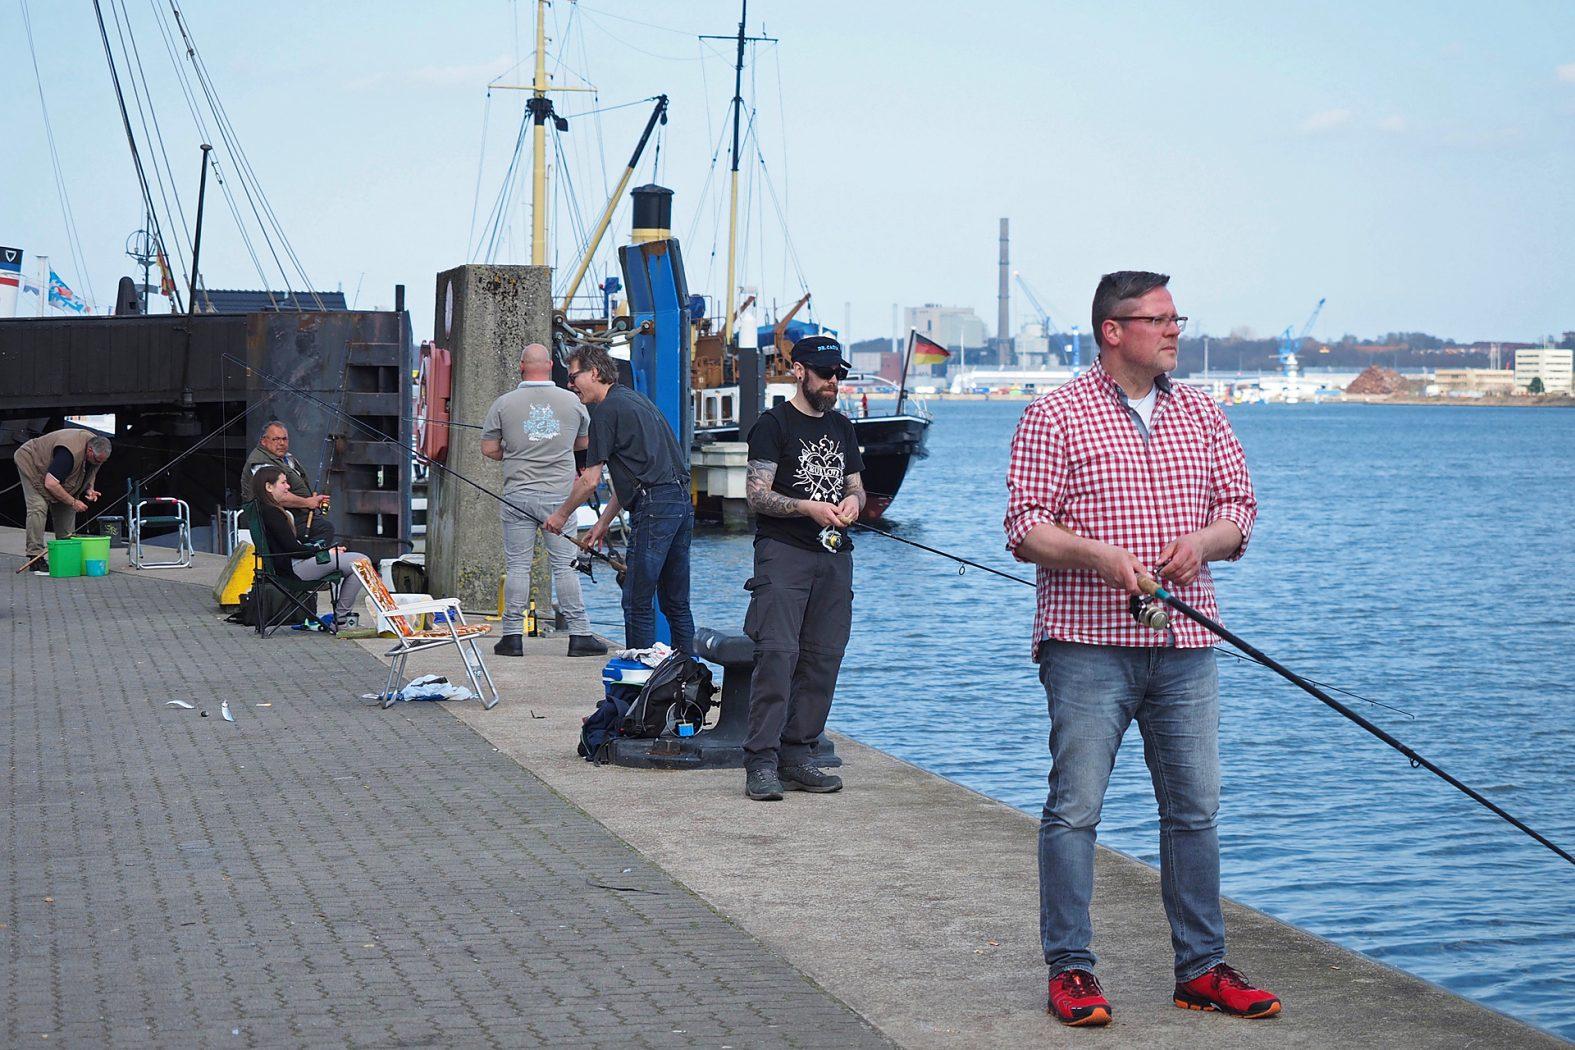 Heringsangeln im Kieler Hafen